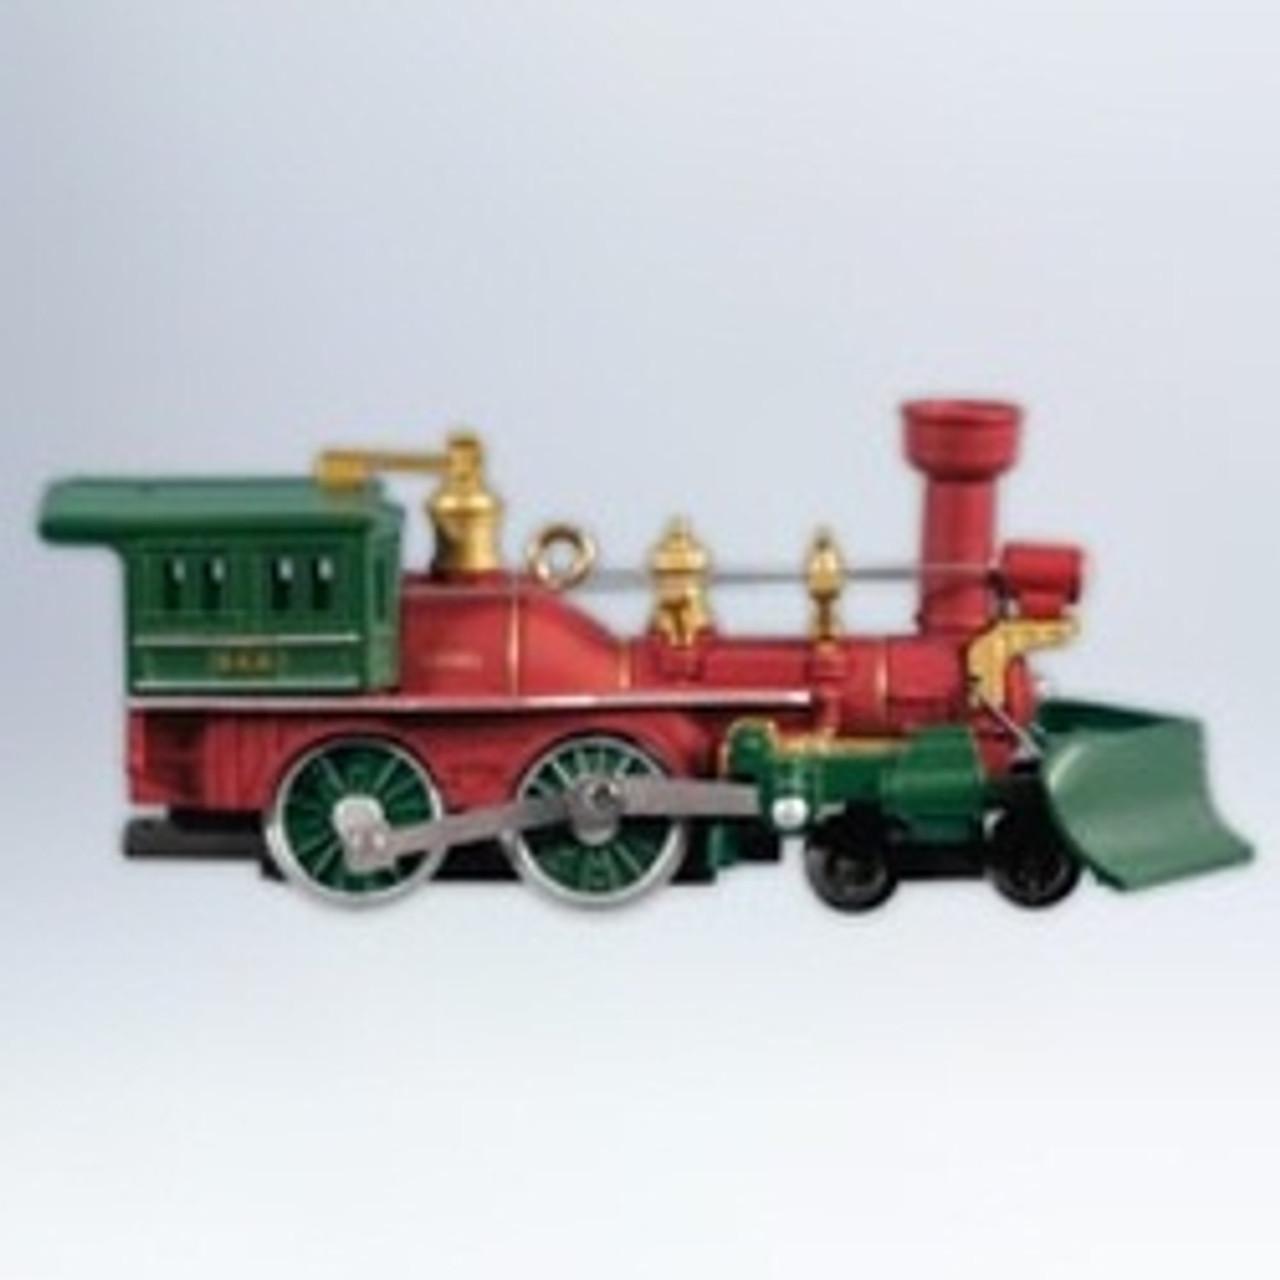 Lionel Christmas Train.2012 Lionel Nutcracker Route Christmas Train 17